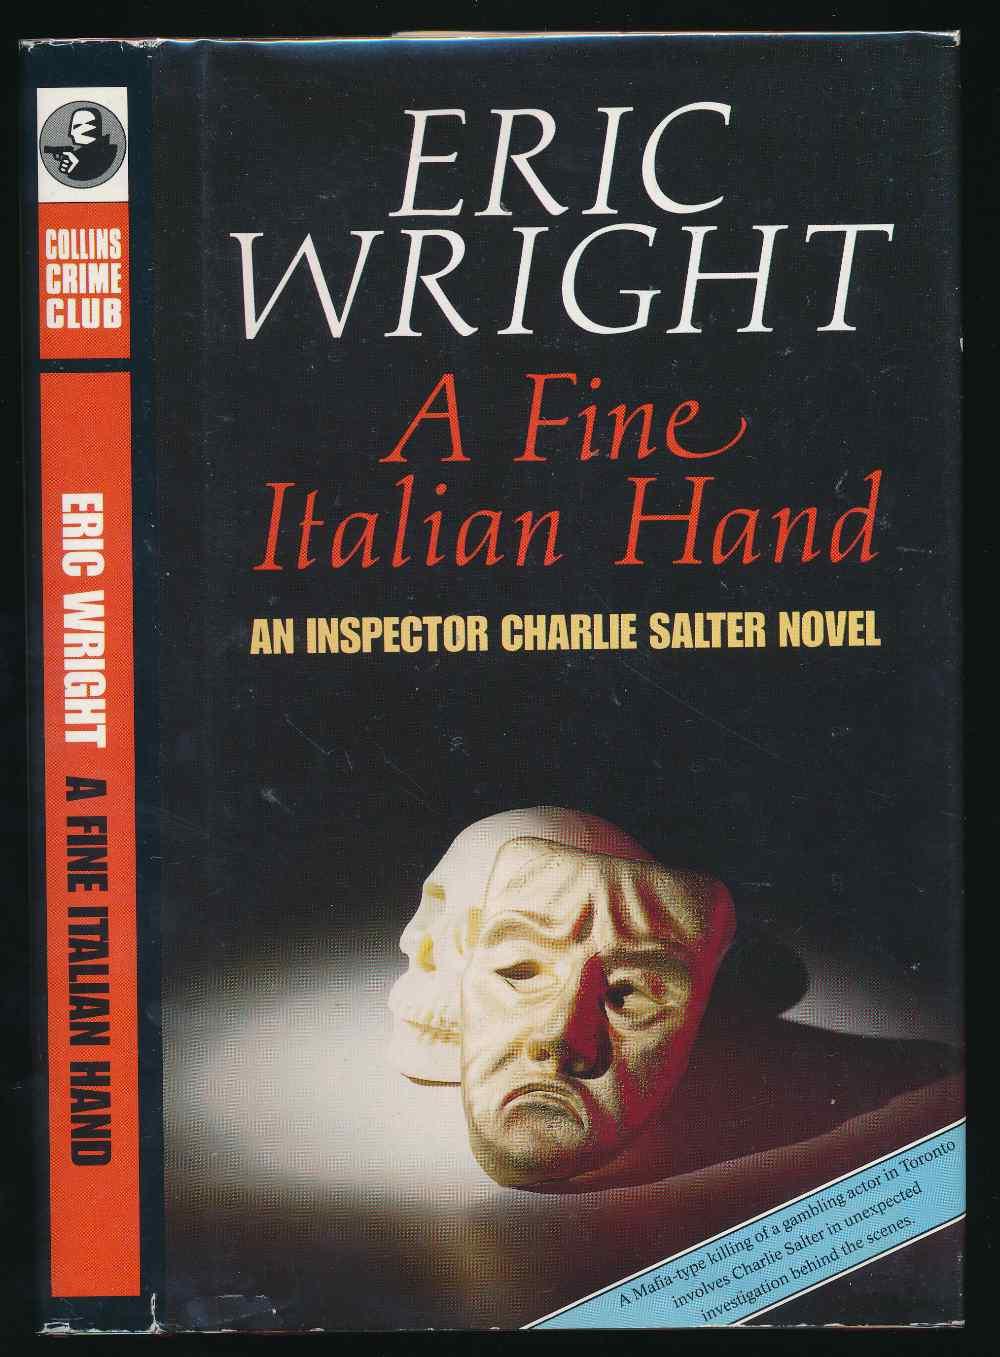 A fine Italian hand: an Inspector Charlie Salter novel